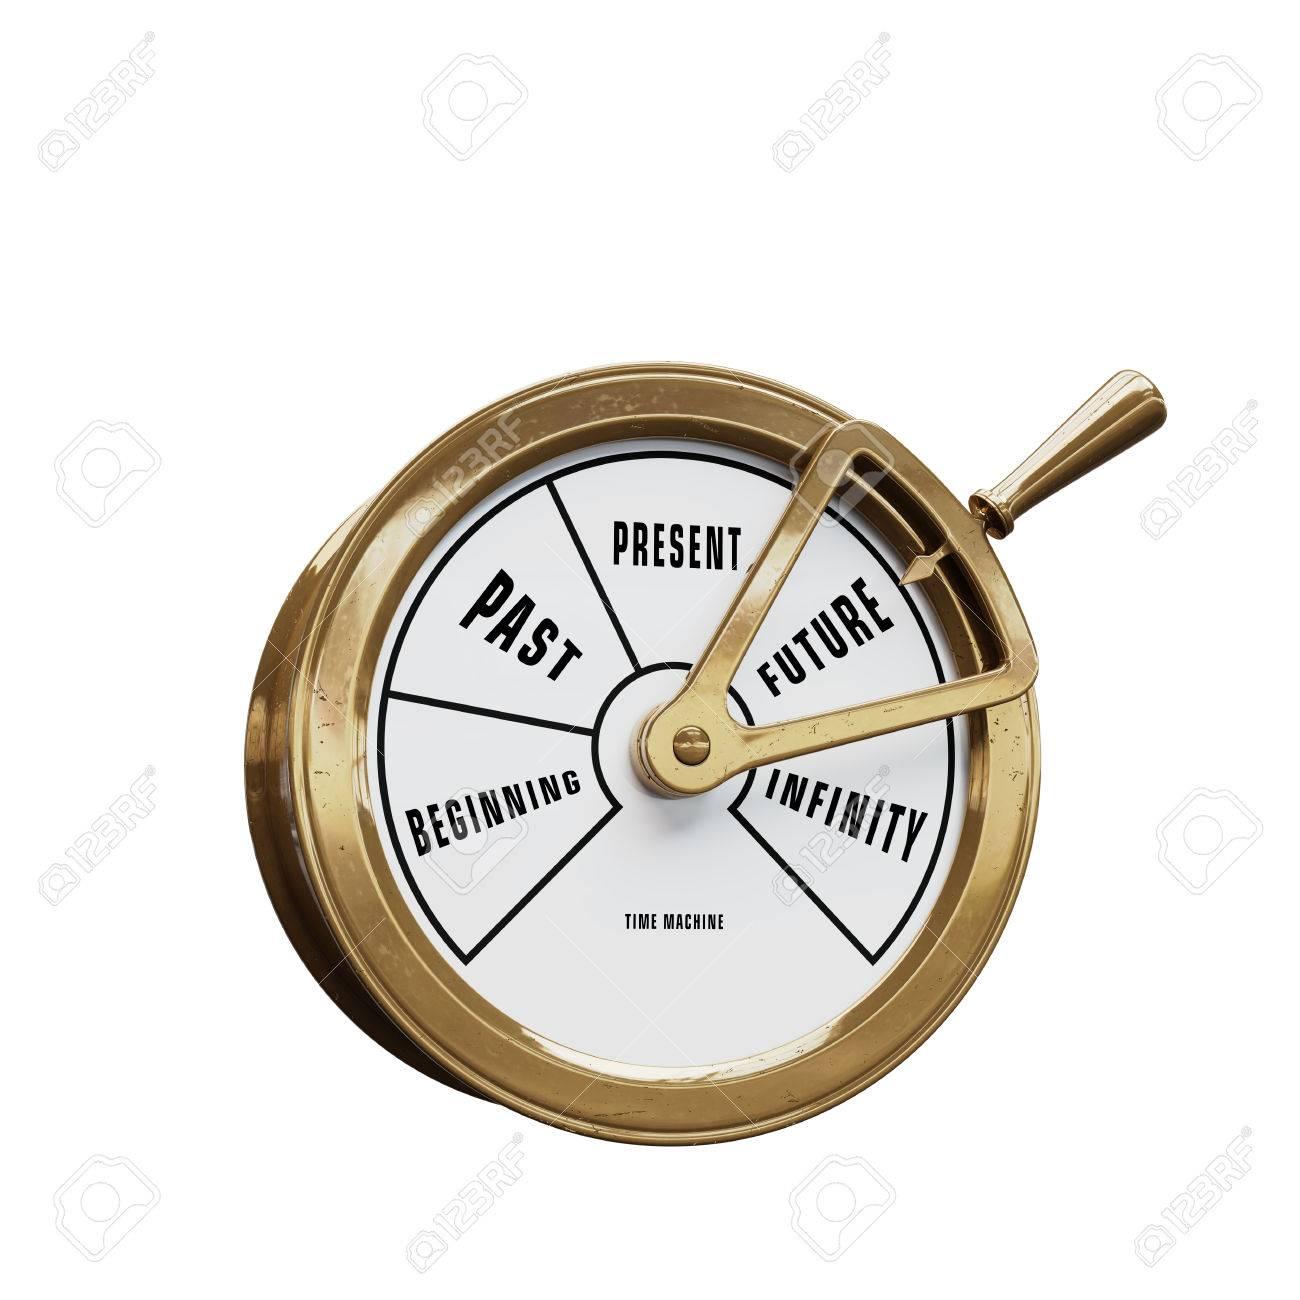 Ship telegraph time machine going to the Future - 86328276